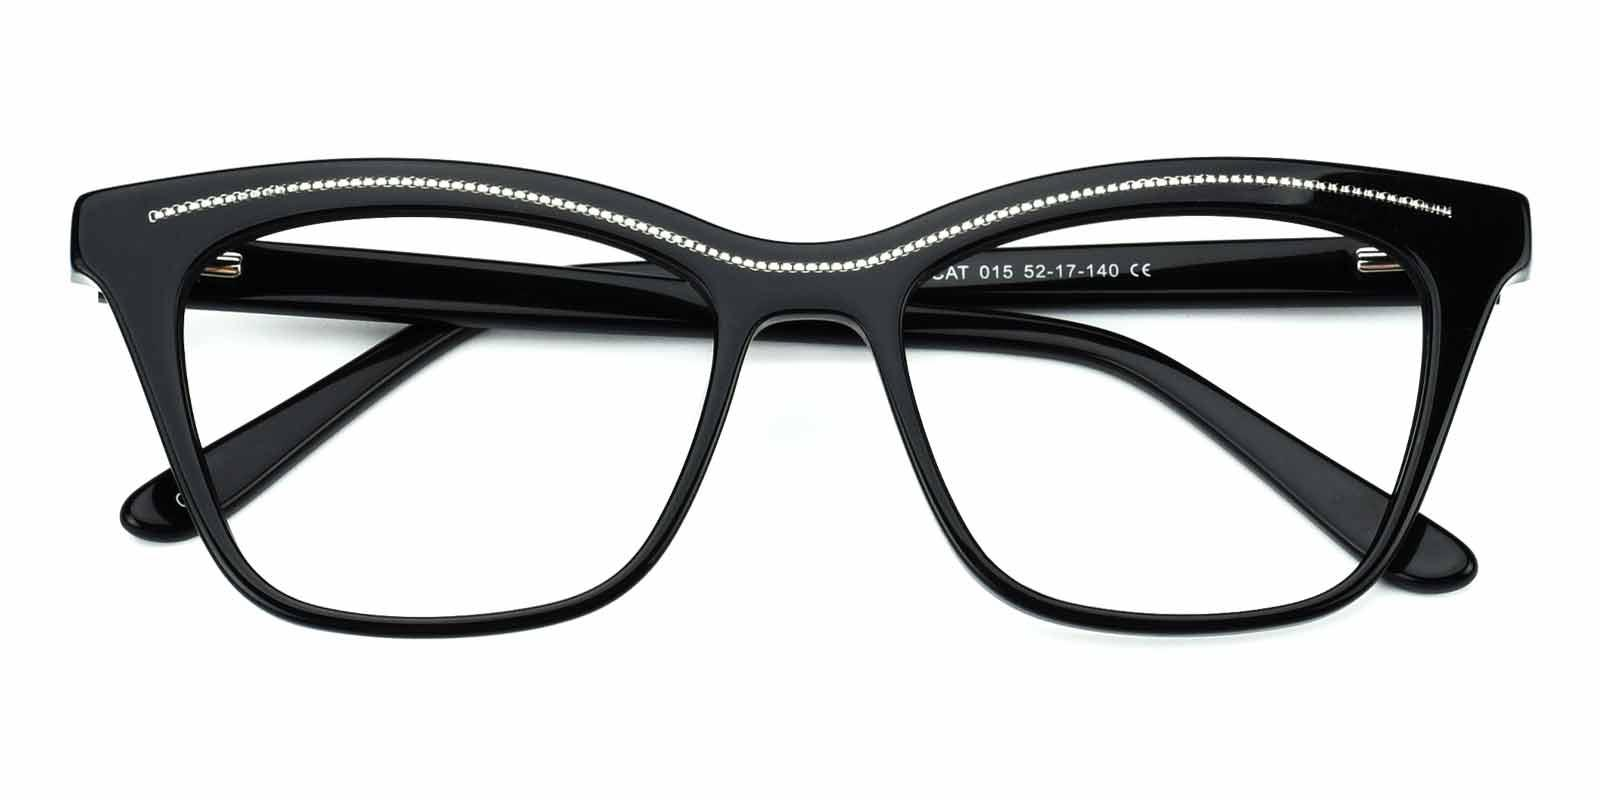 Tina-Black-Browline-Acetate-Eyeglasses-detail